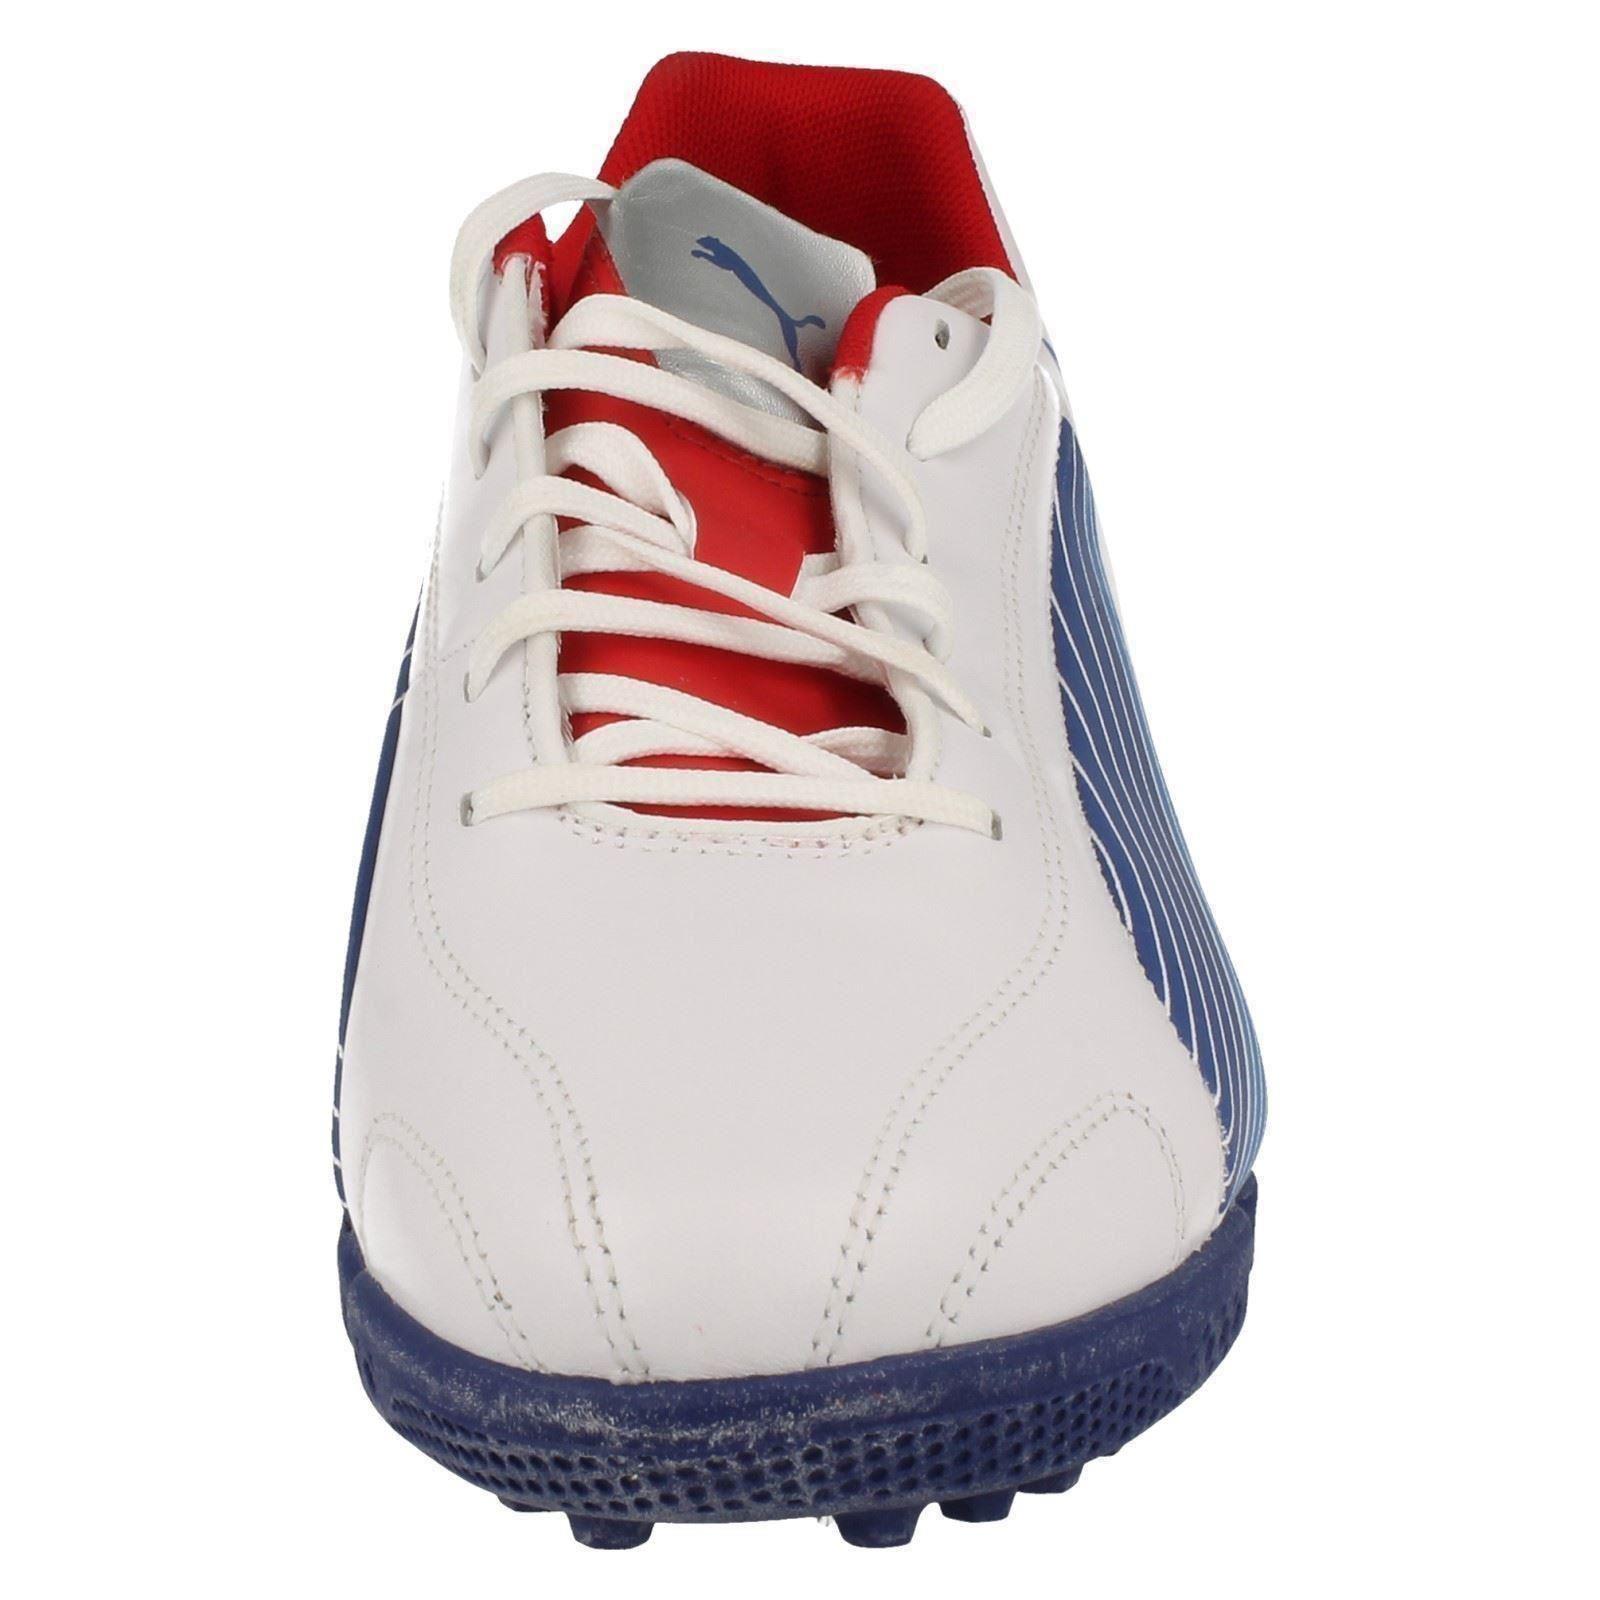 Puma deportivas Evospeed limoges Sporty para Red Zapatillas hombre White p Look ribbon R1Bgxq6